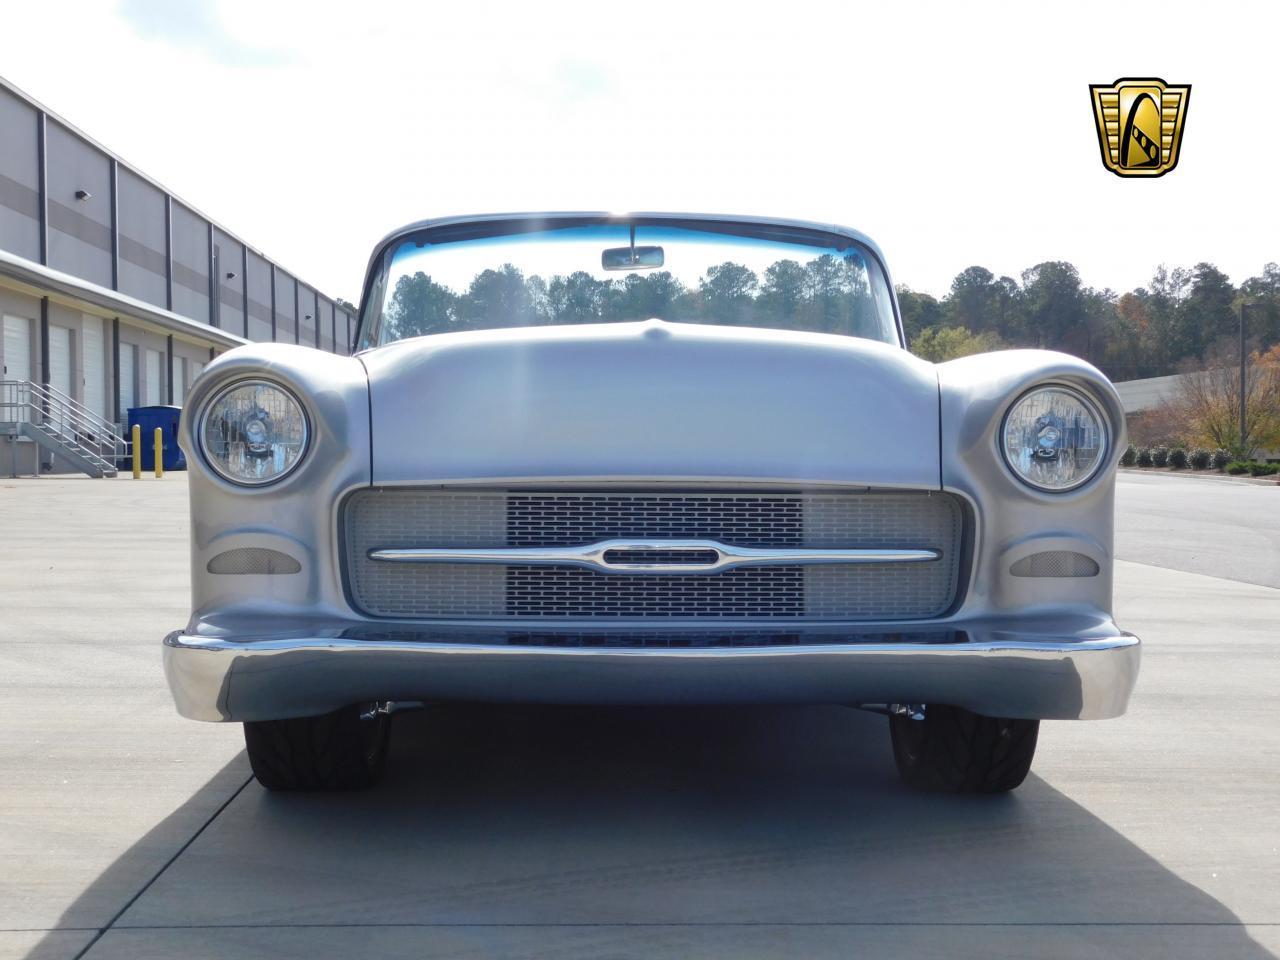 Large Picture of Classic '55 Bel Air located in Alpharetta Georgia - $199,000.00 Offered by Gateway Classic Cars - Atlanta - MDI3